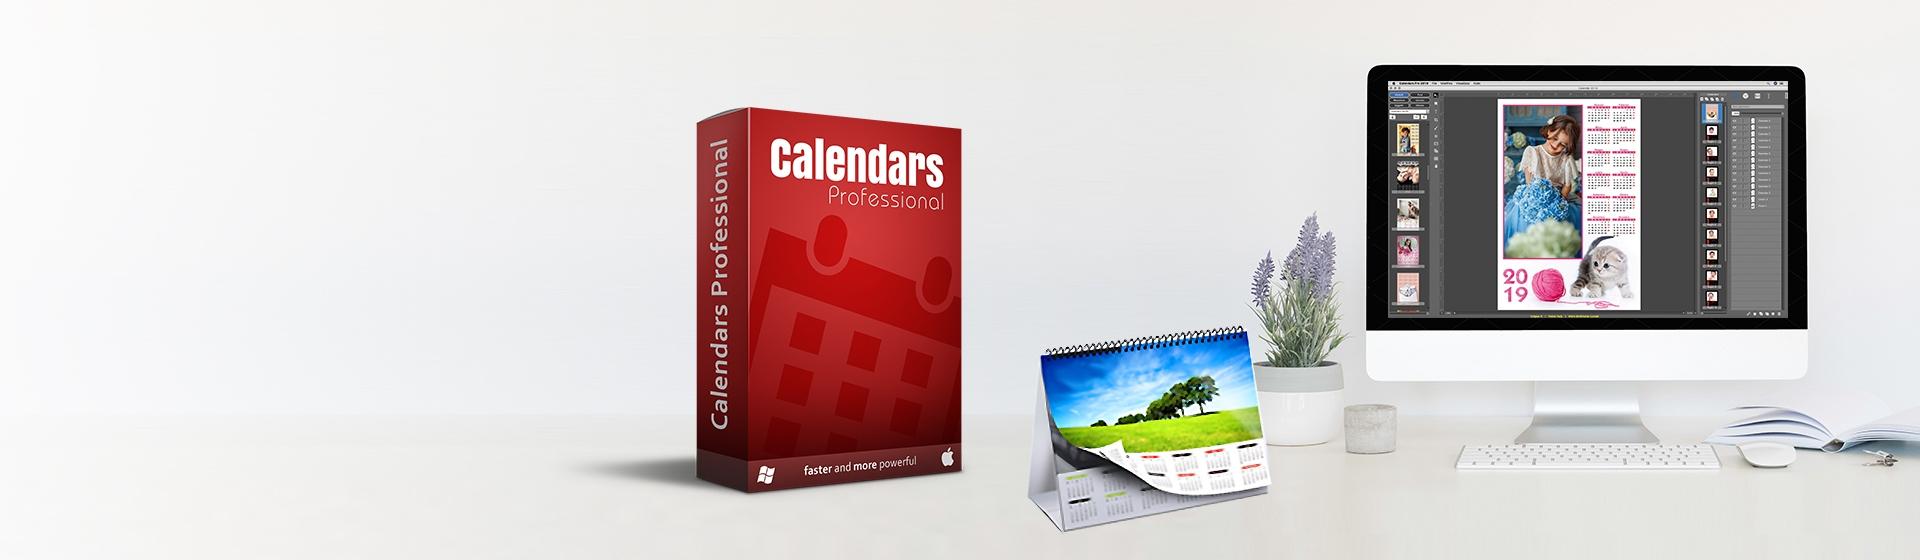 Calendars Professional